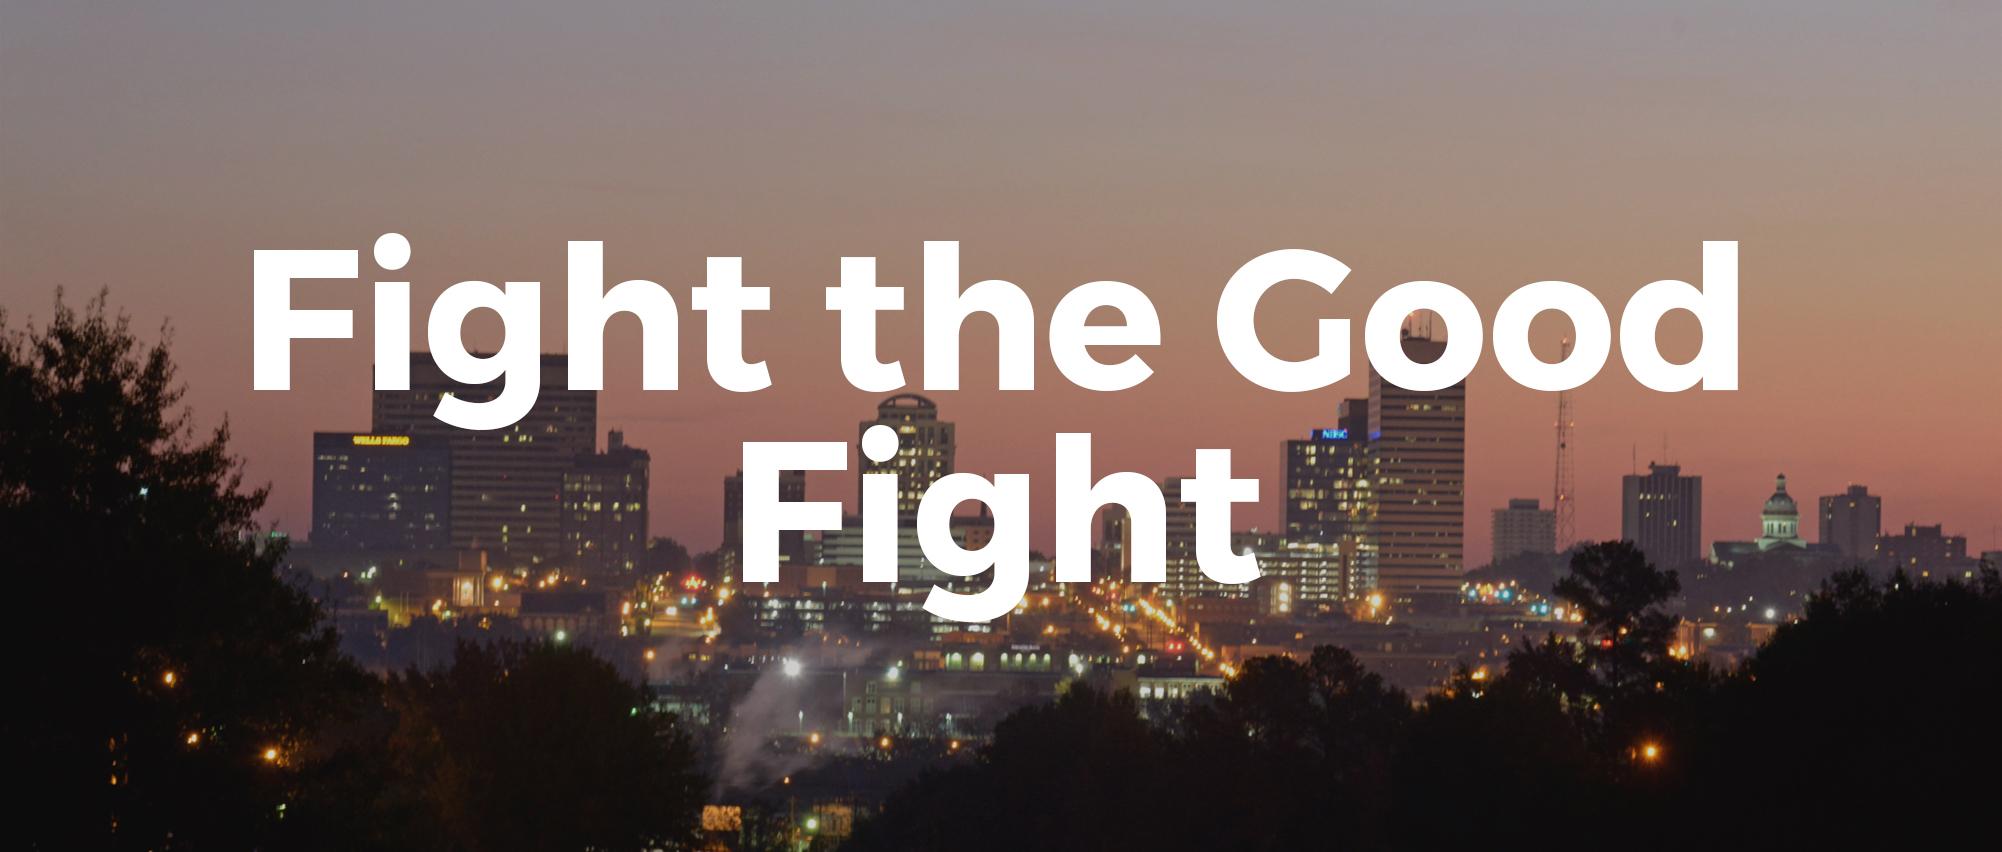 Fight the Good Fight.jpg